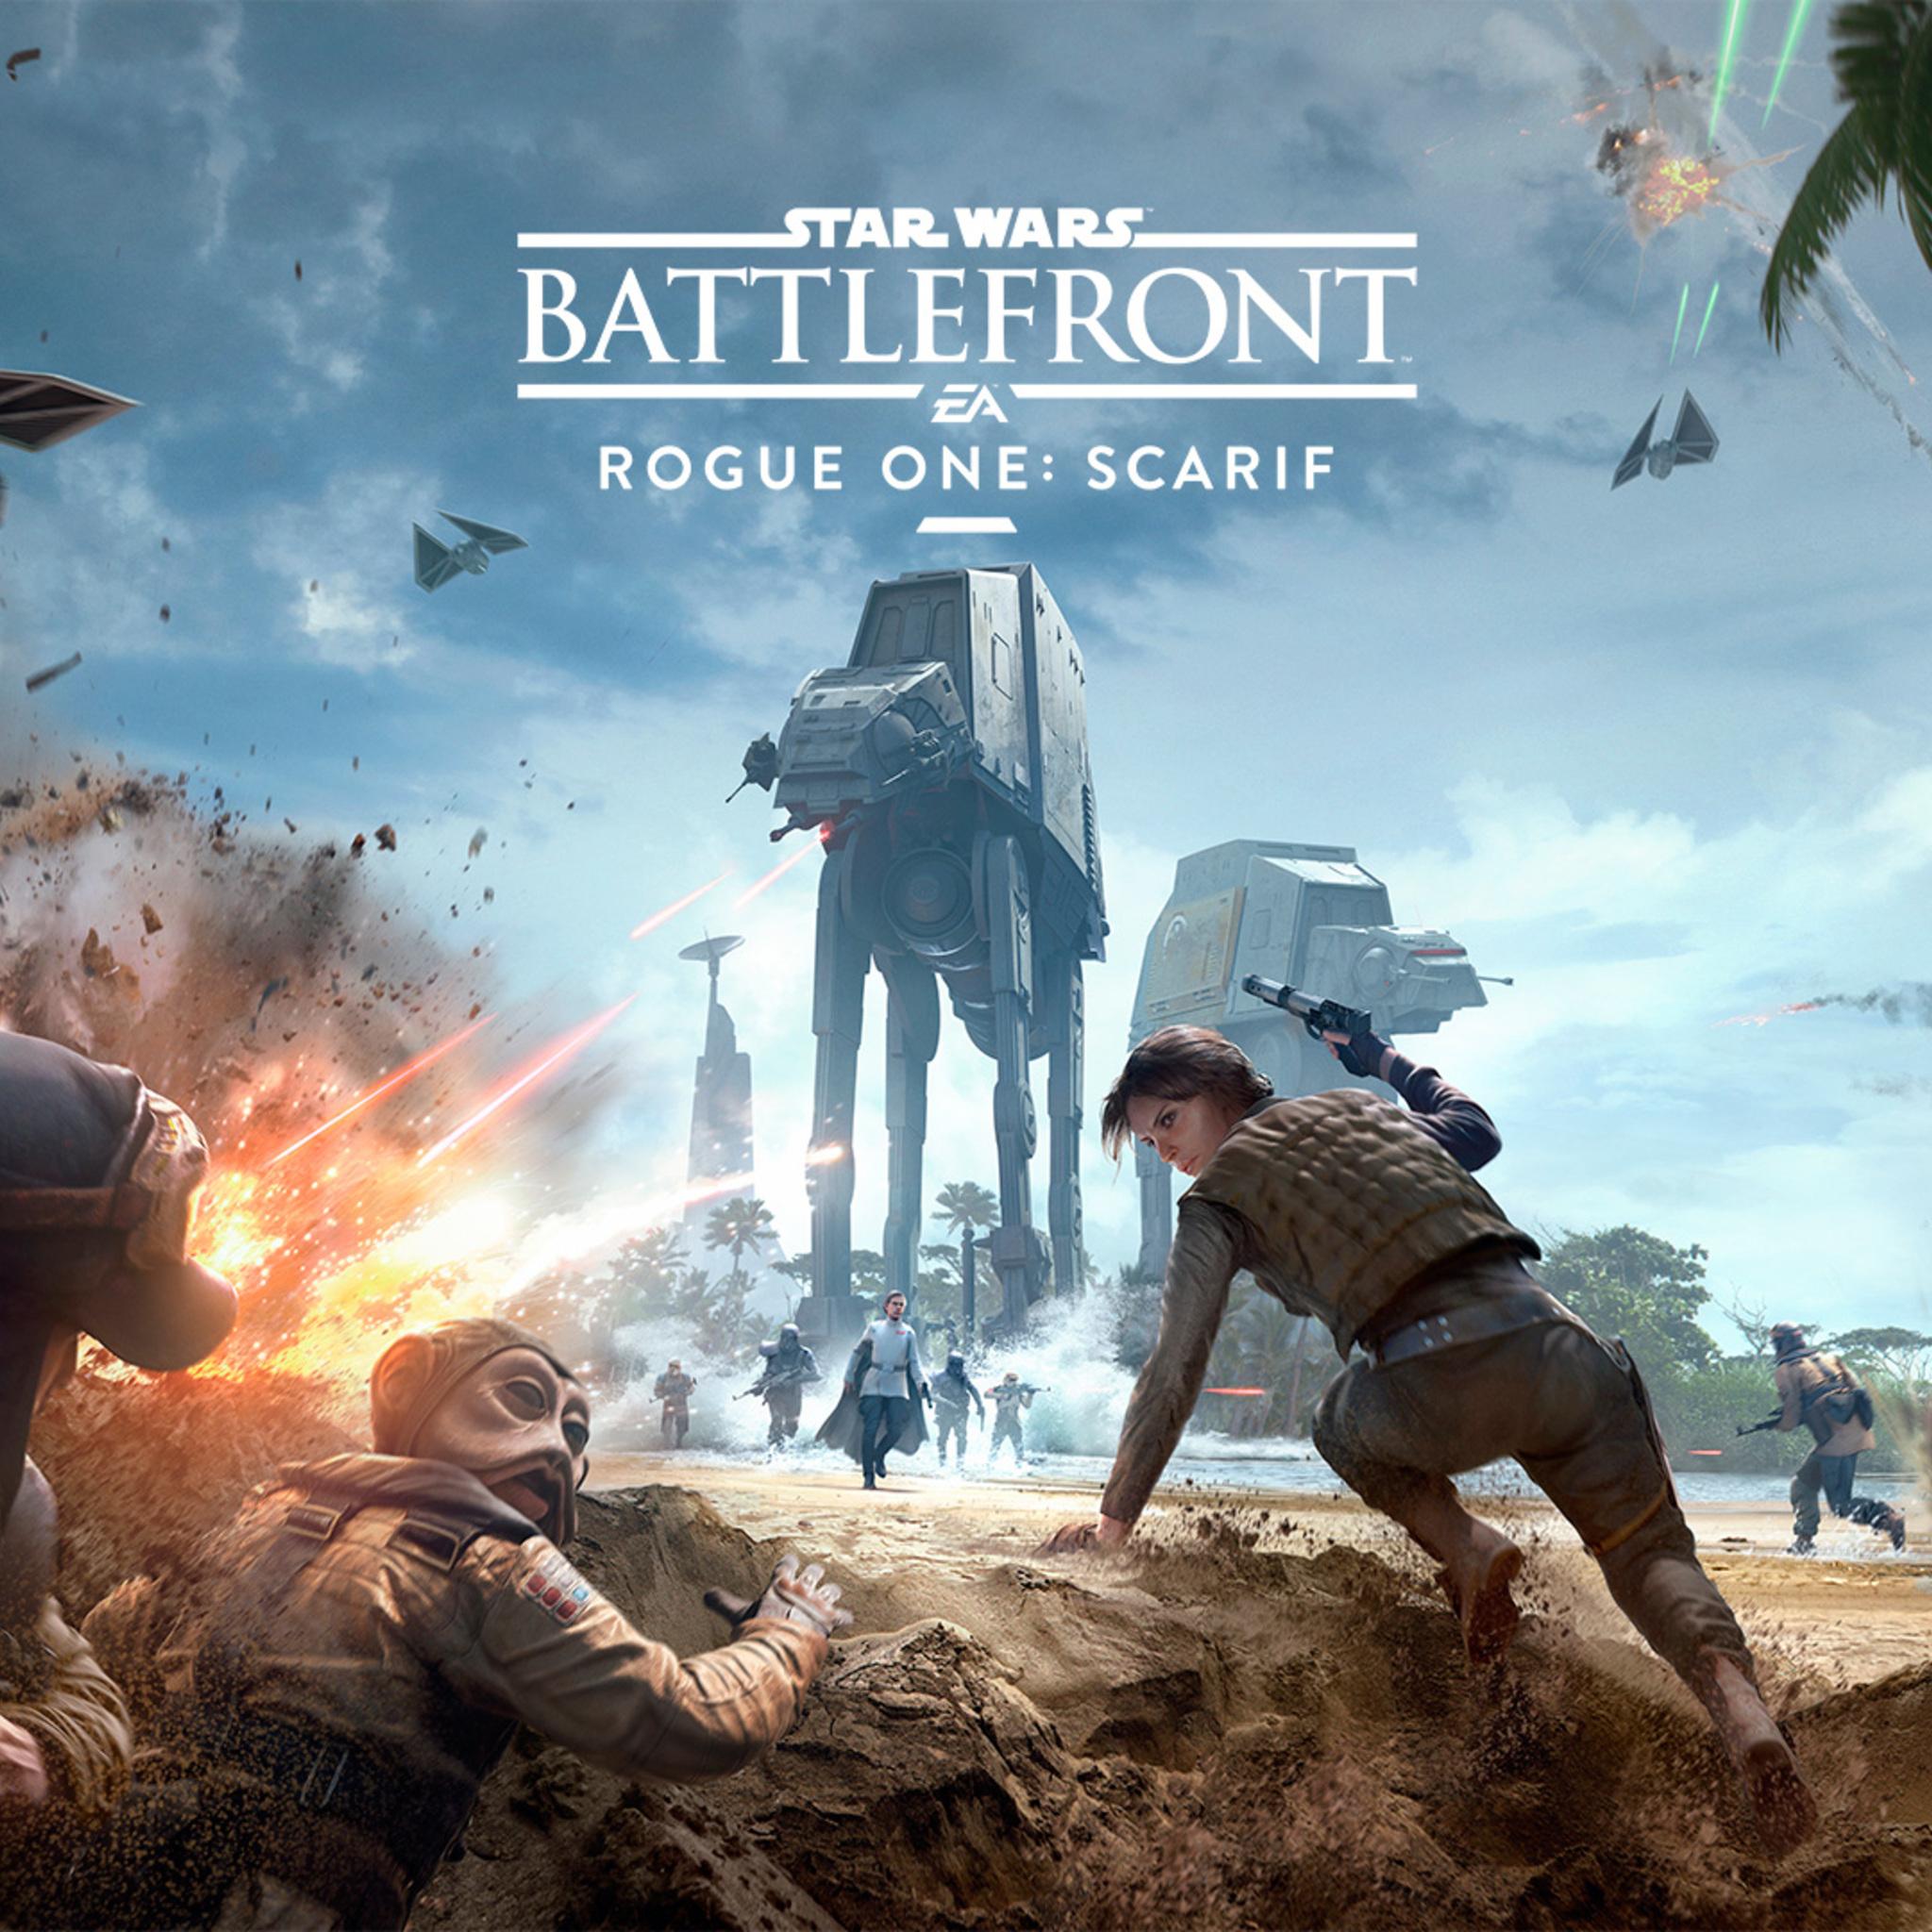 2048x2048 Star Wars Battlefront Rogue One DLC Ipad Air HD